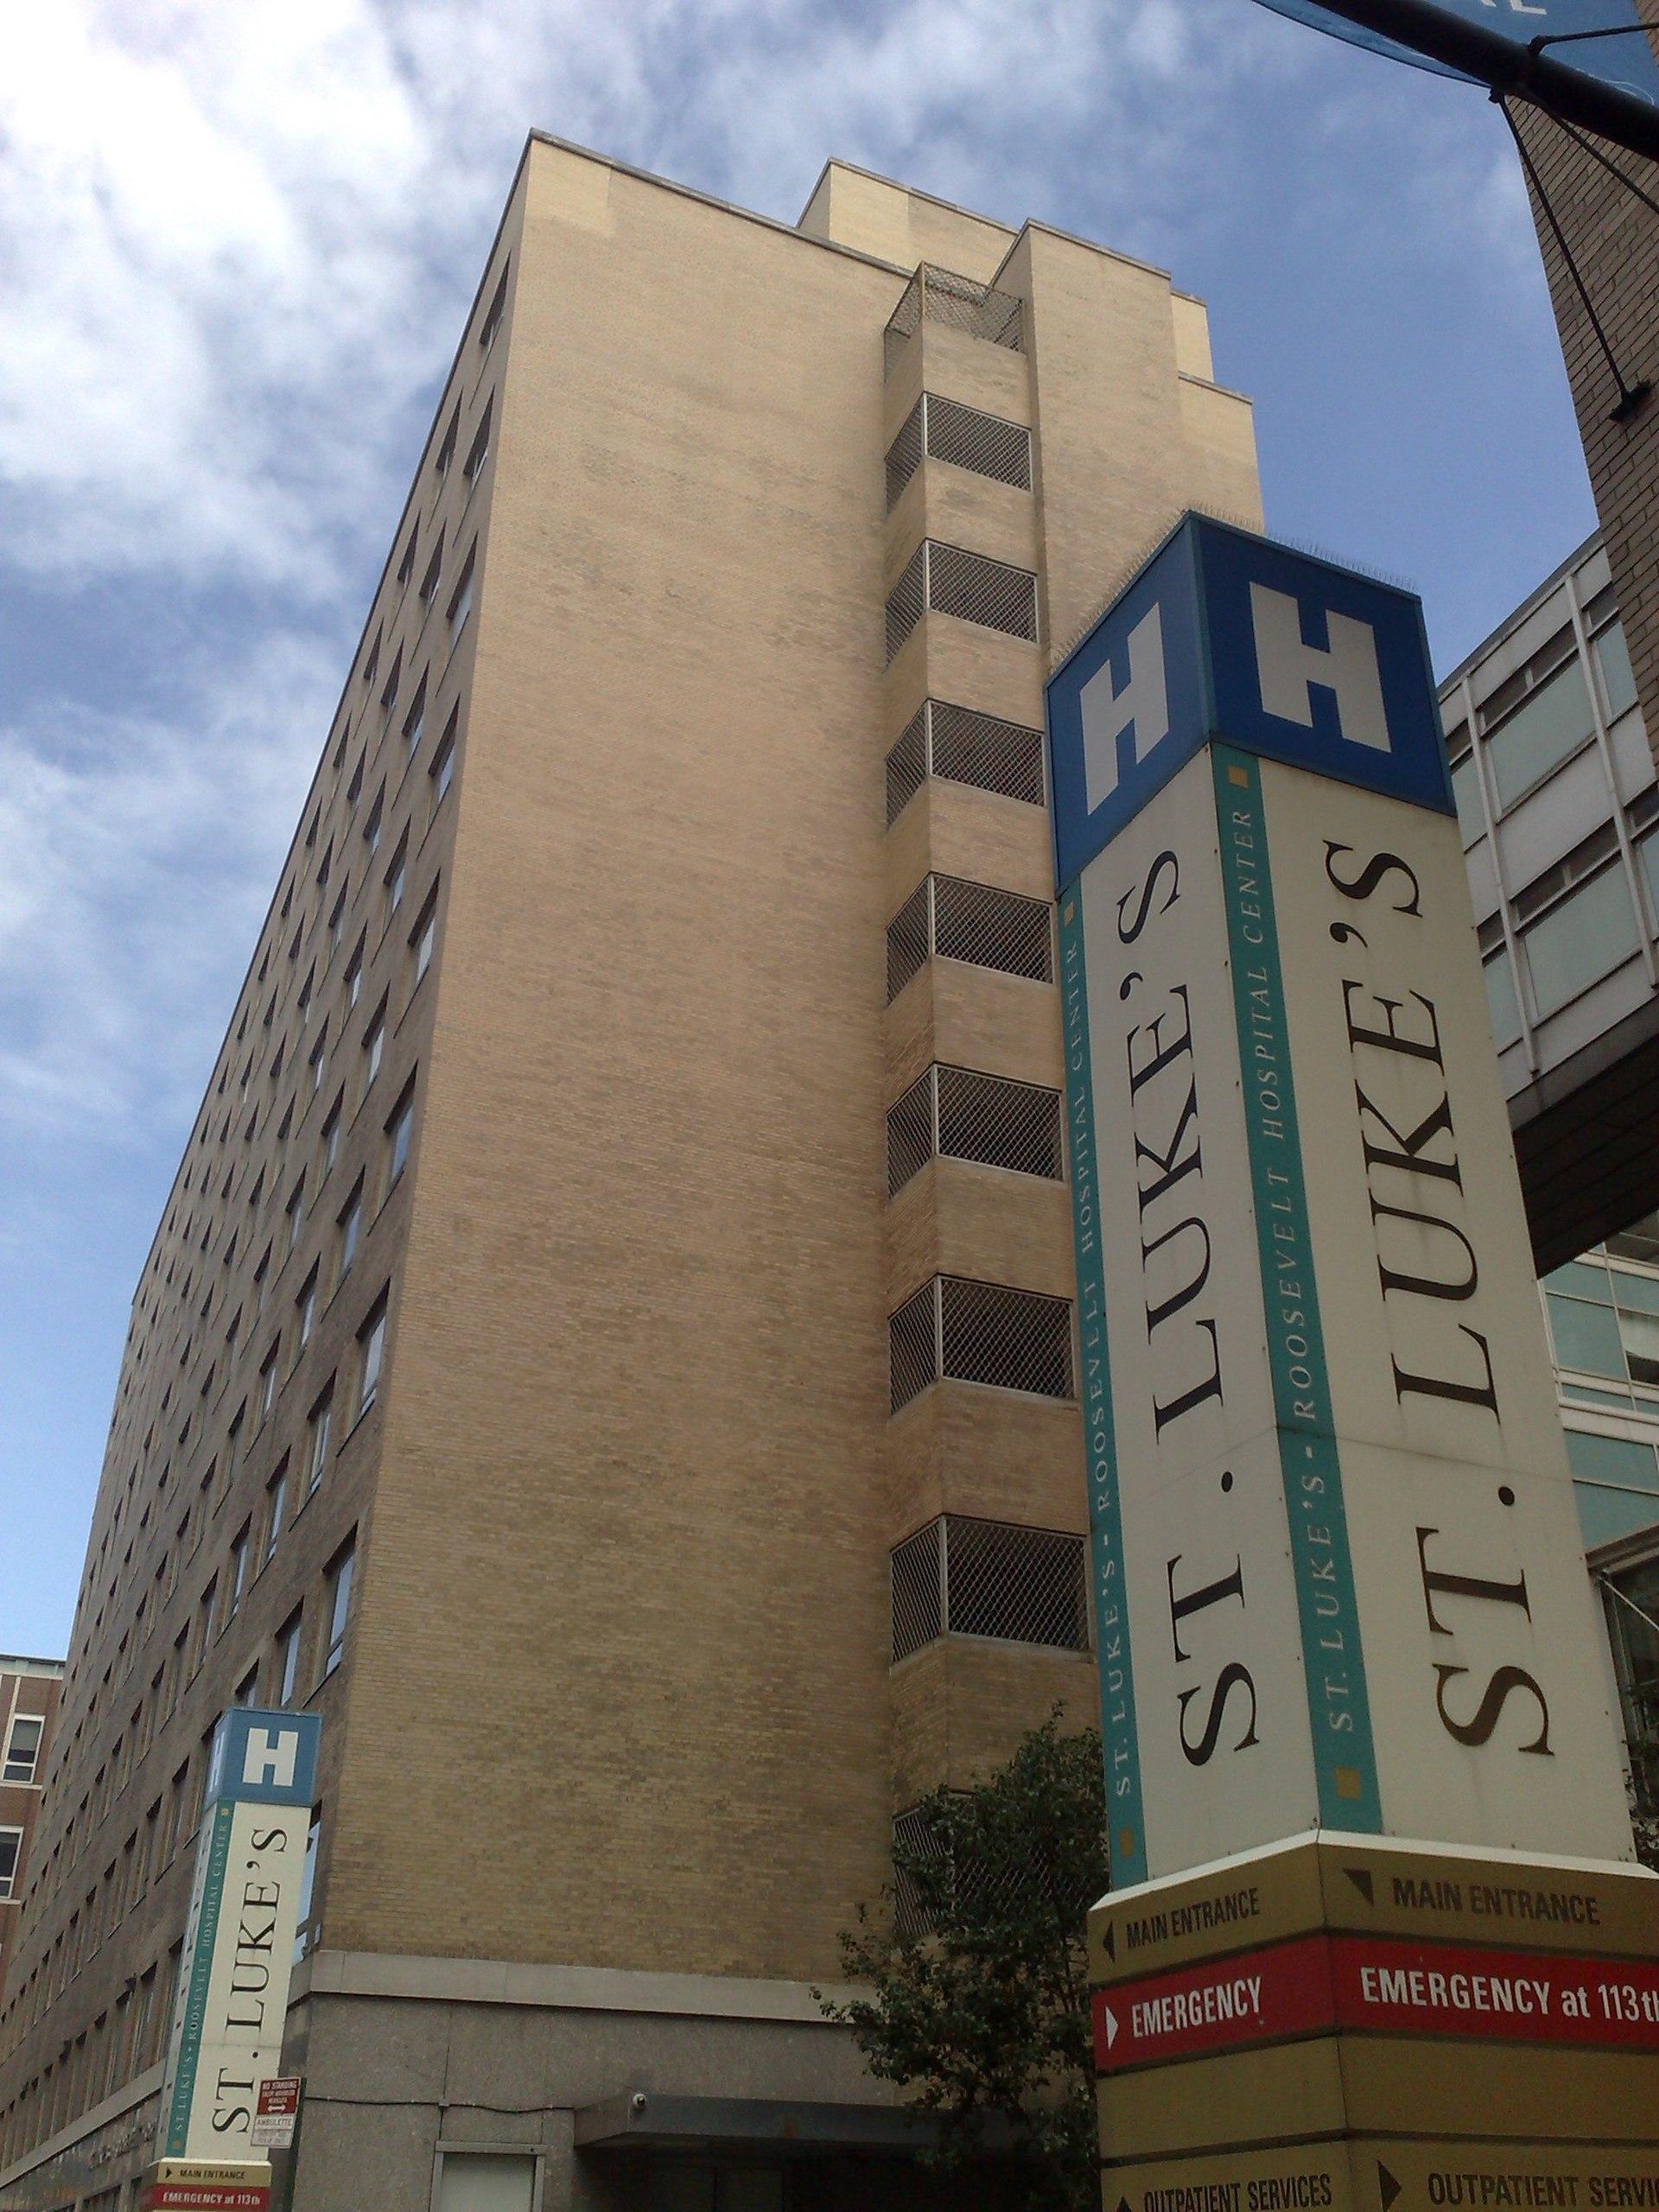 Mount Sinai Emergency Room Number